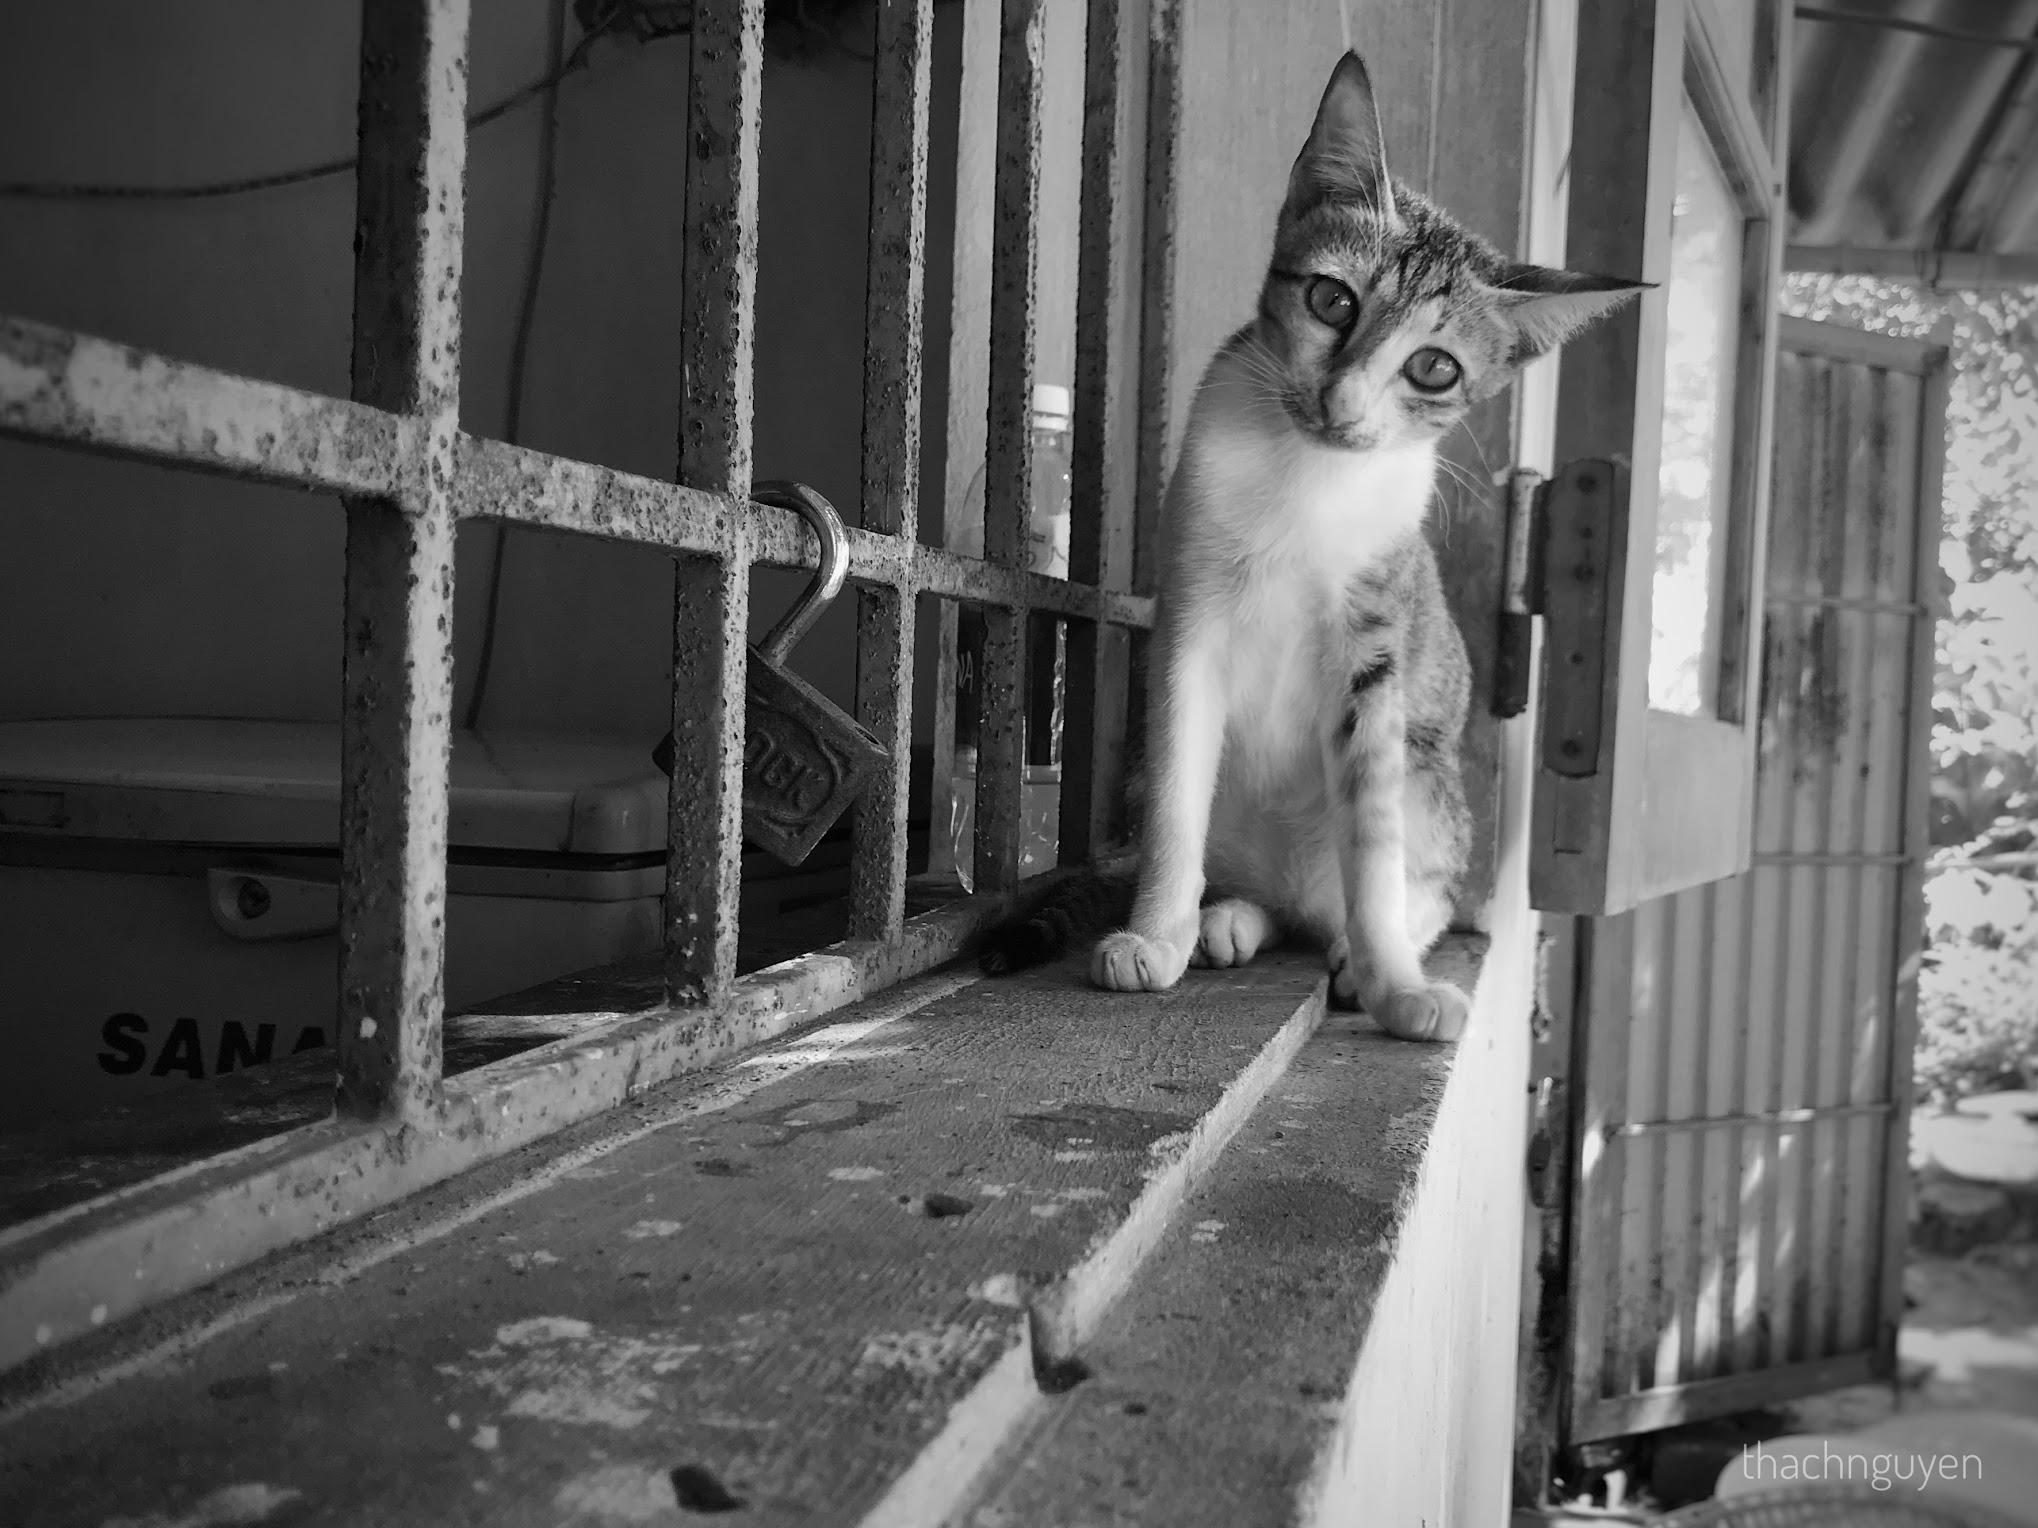 lop-1-cat